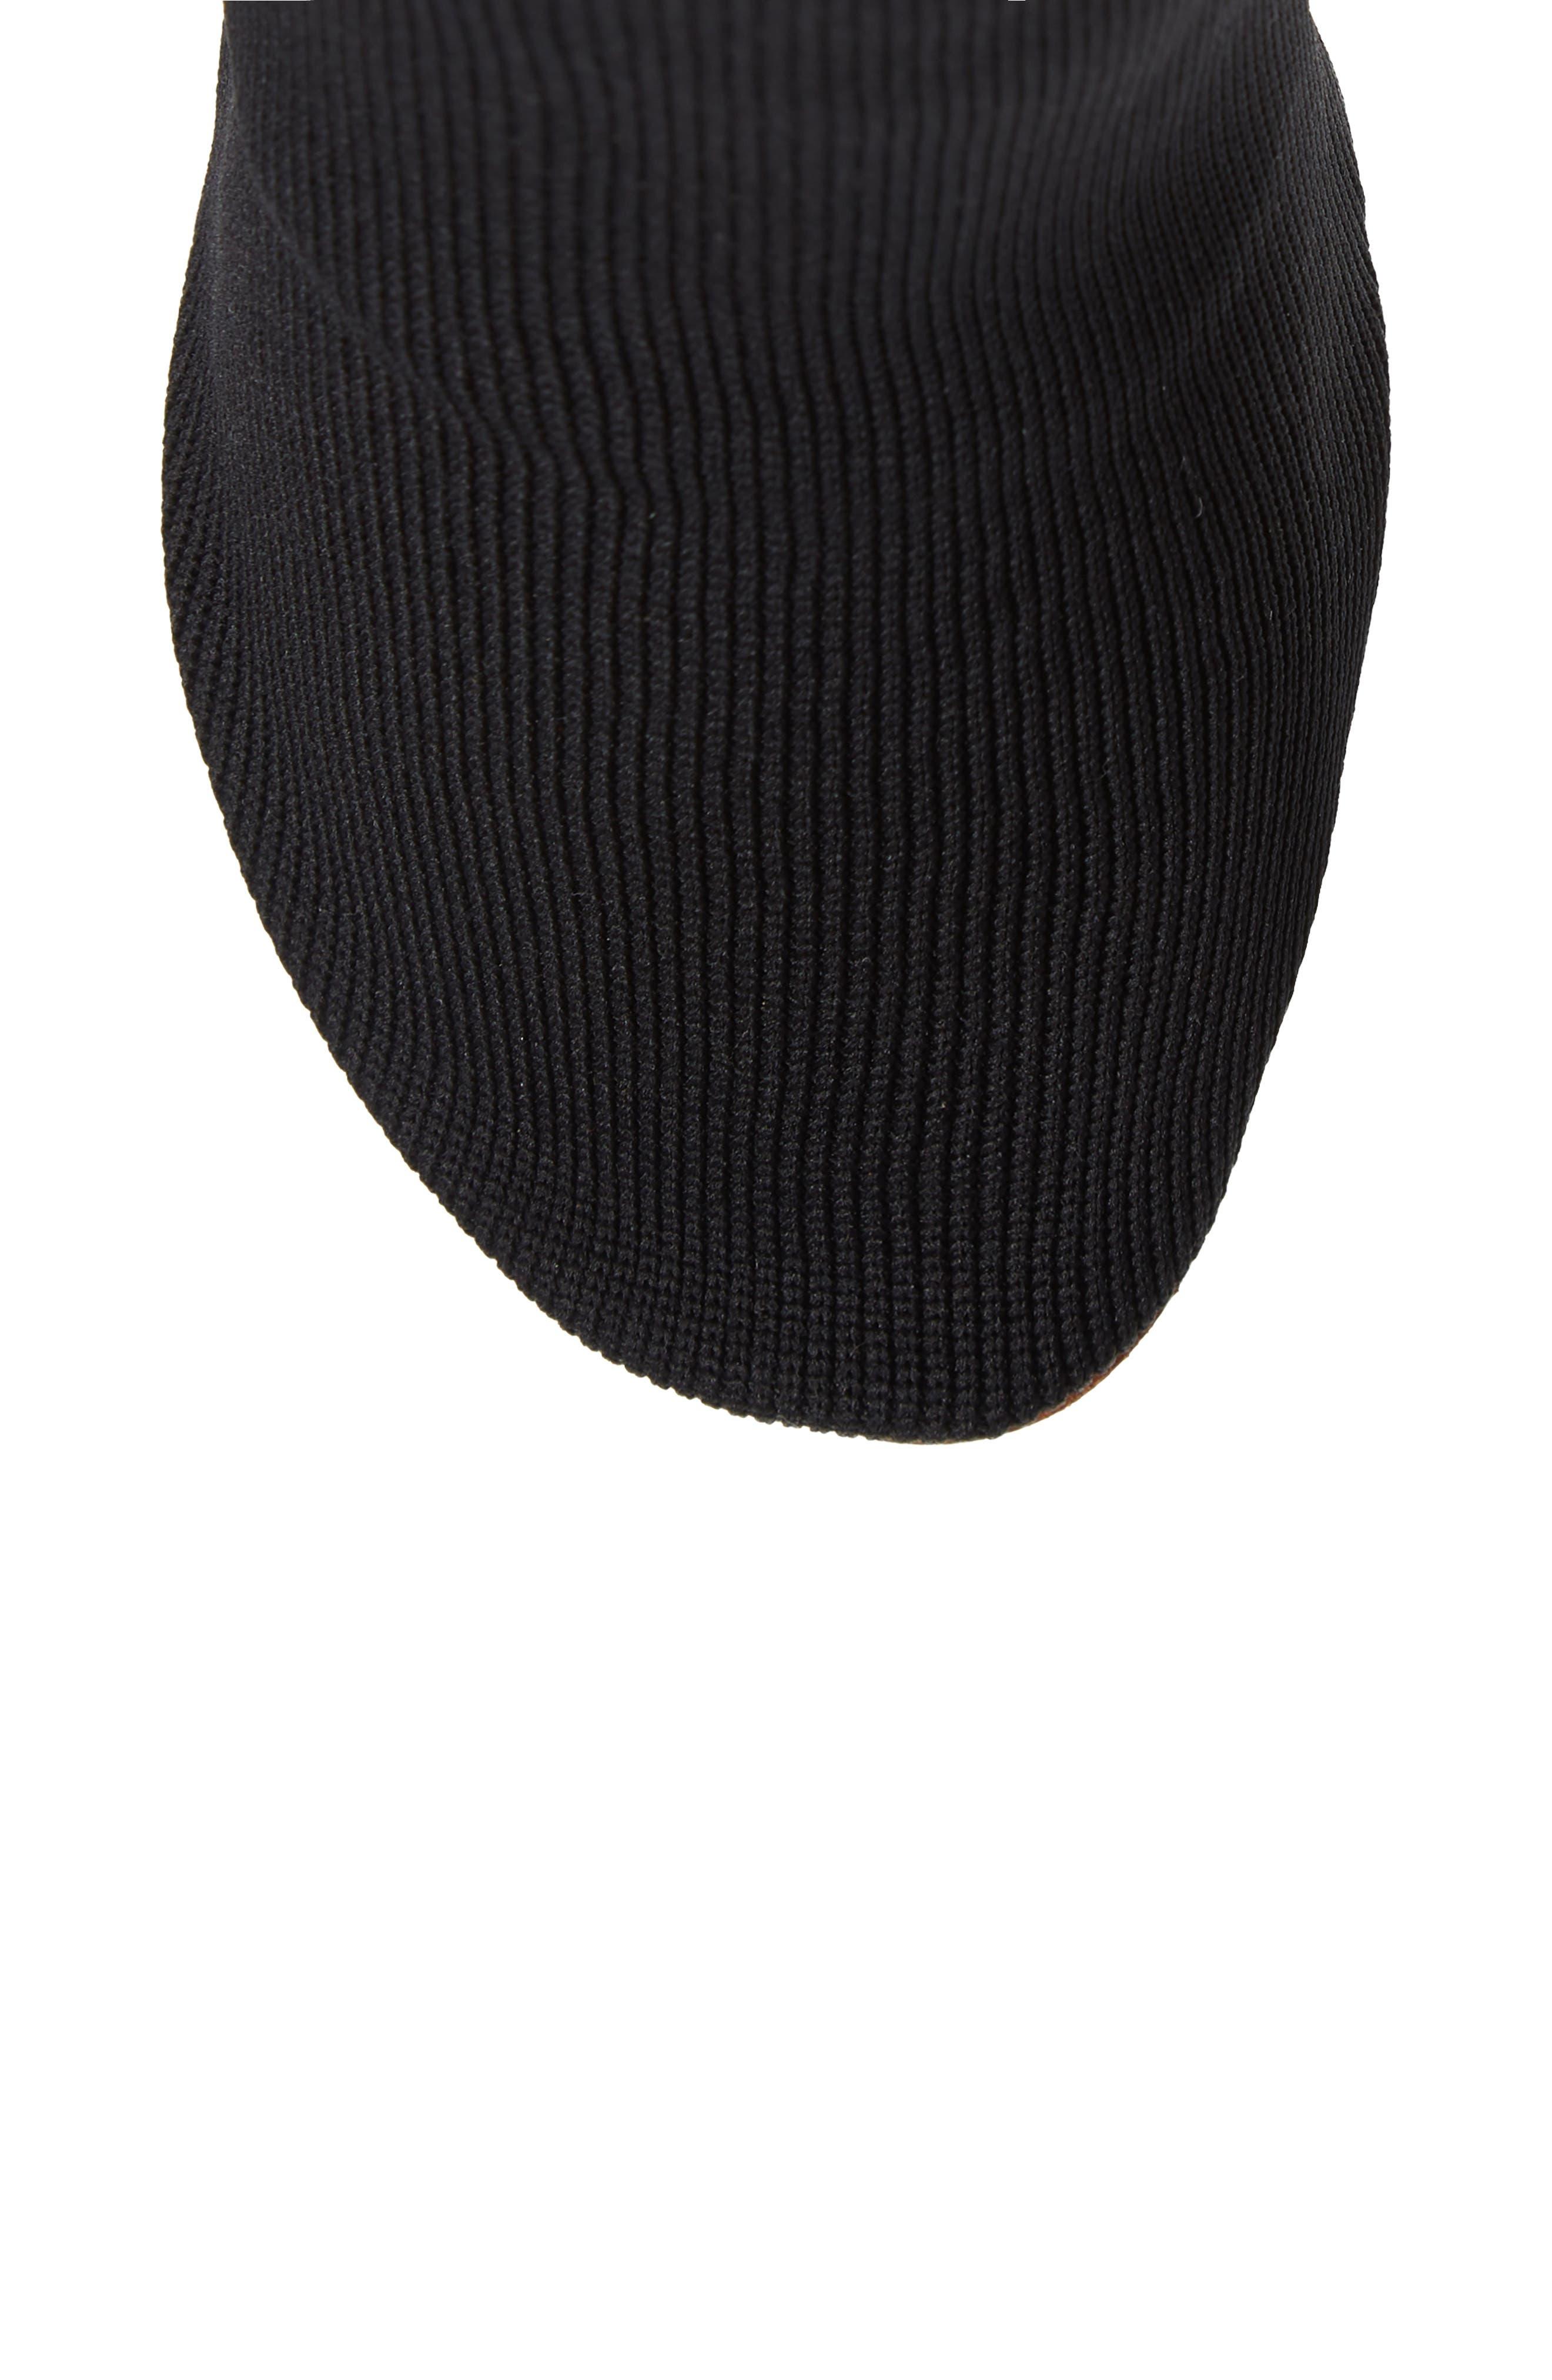 Lighter Sock Boot,                             Alternate thumbnail 5, color,                             BLACK/PRINTED HEEL